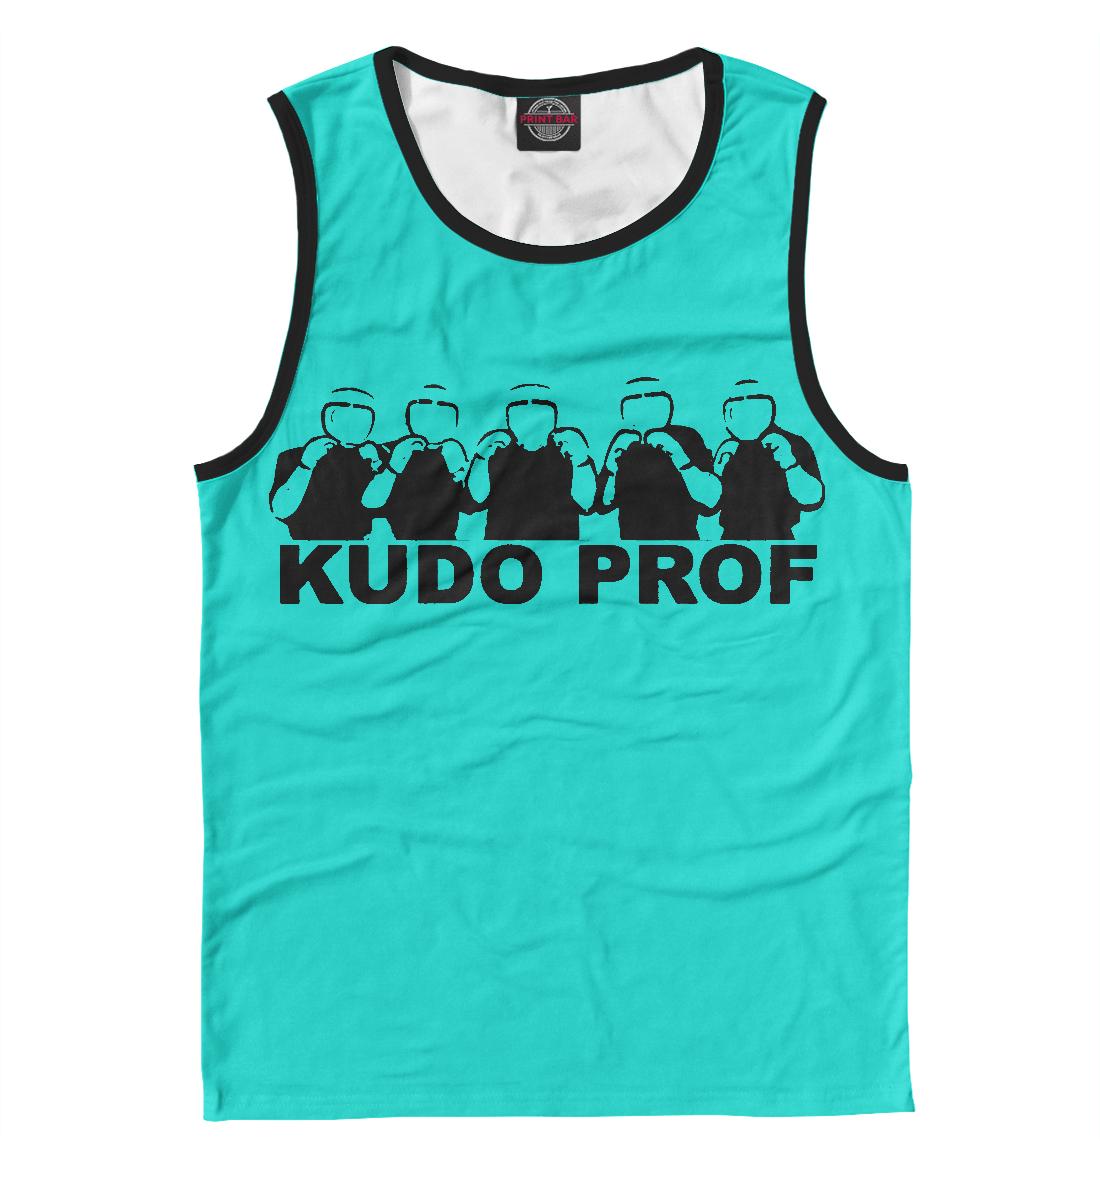 Kudo Prof, Printbar, Майки, EDI-180339-may-2  - купить со скидкой